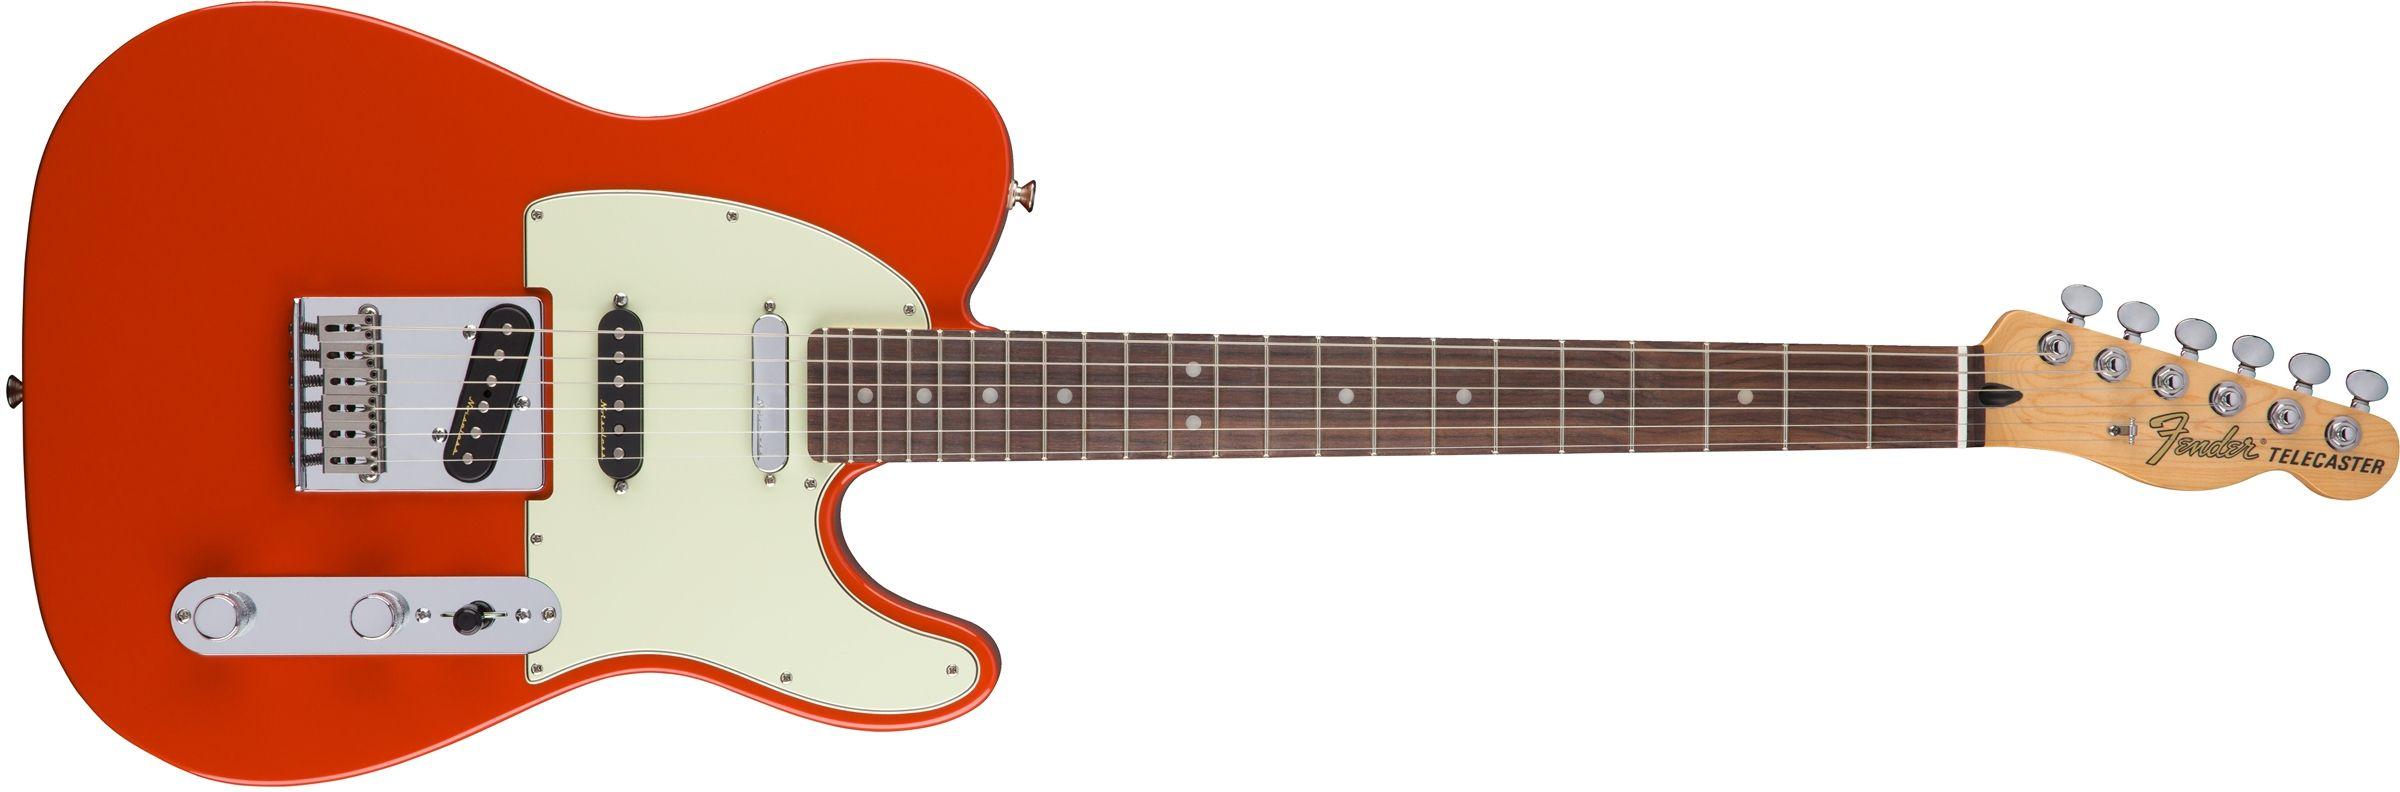 Deluxe Nashville Tele Electric Guitars Electric Guitar Fender Deluxe Fender Electric Guitar